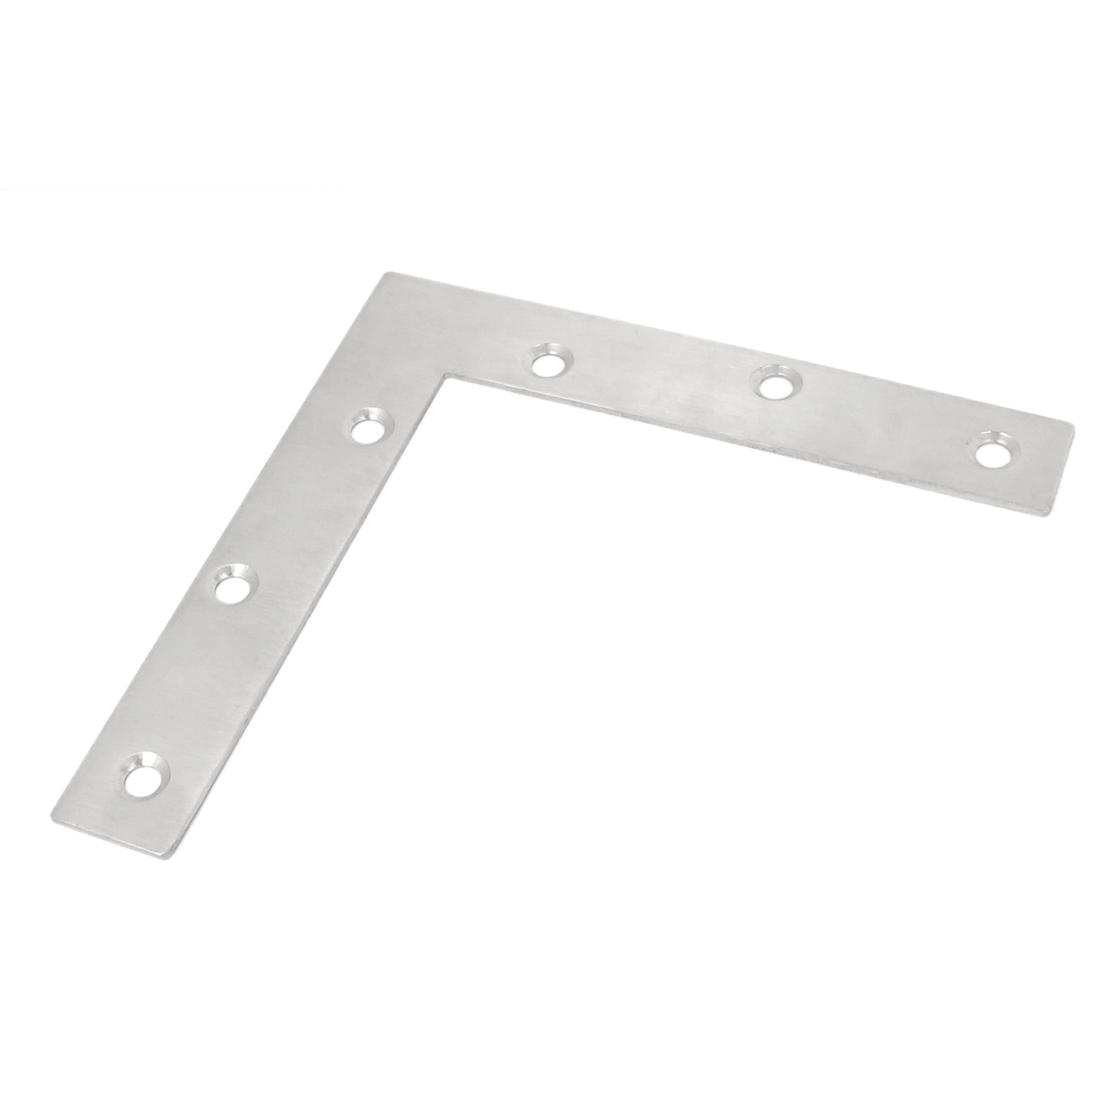 150mmx150mm Flat L Shape Corner Brace Mending Plate Right Angle Bracket